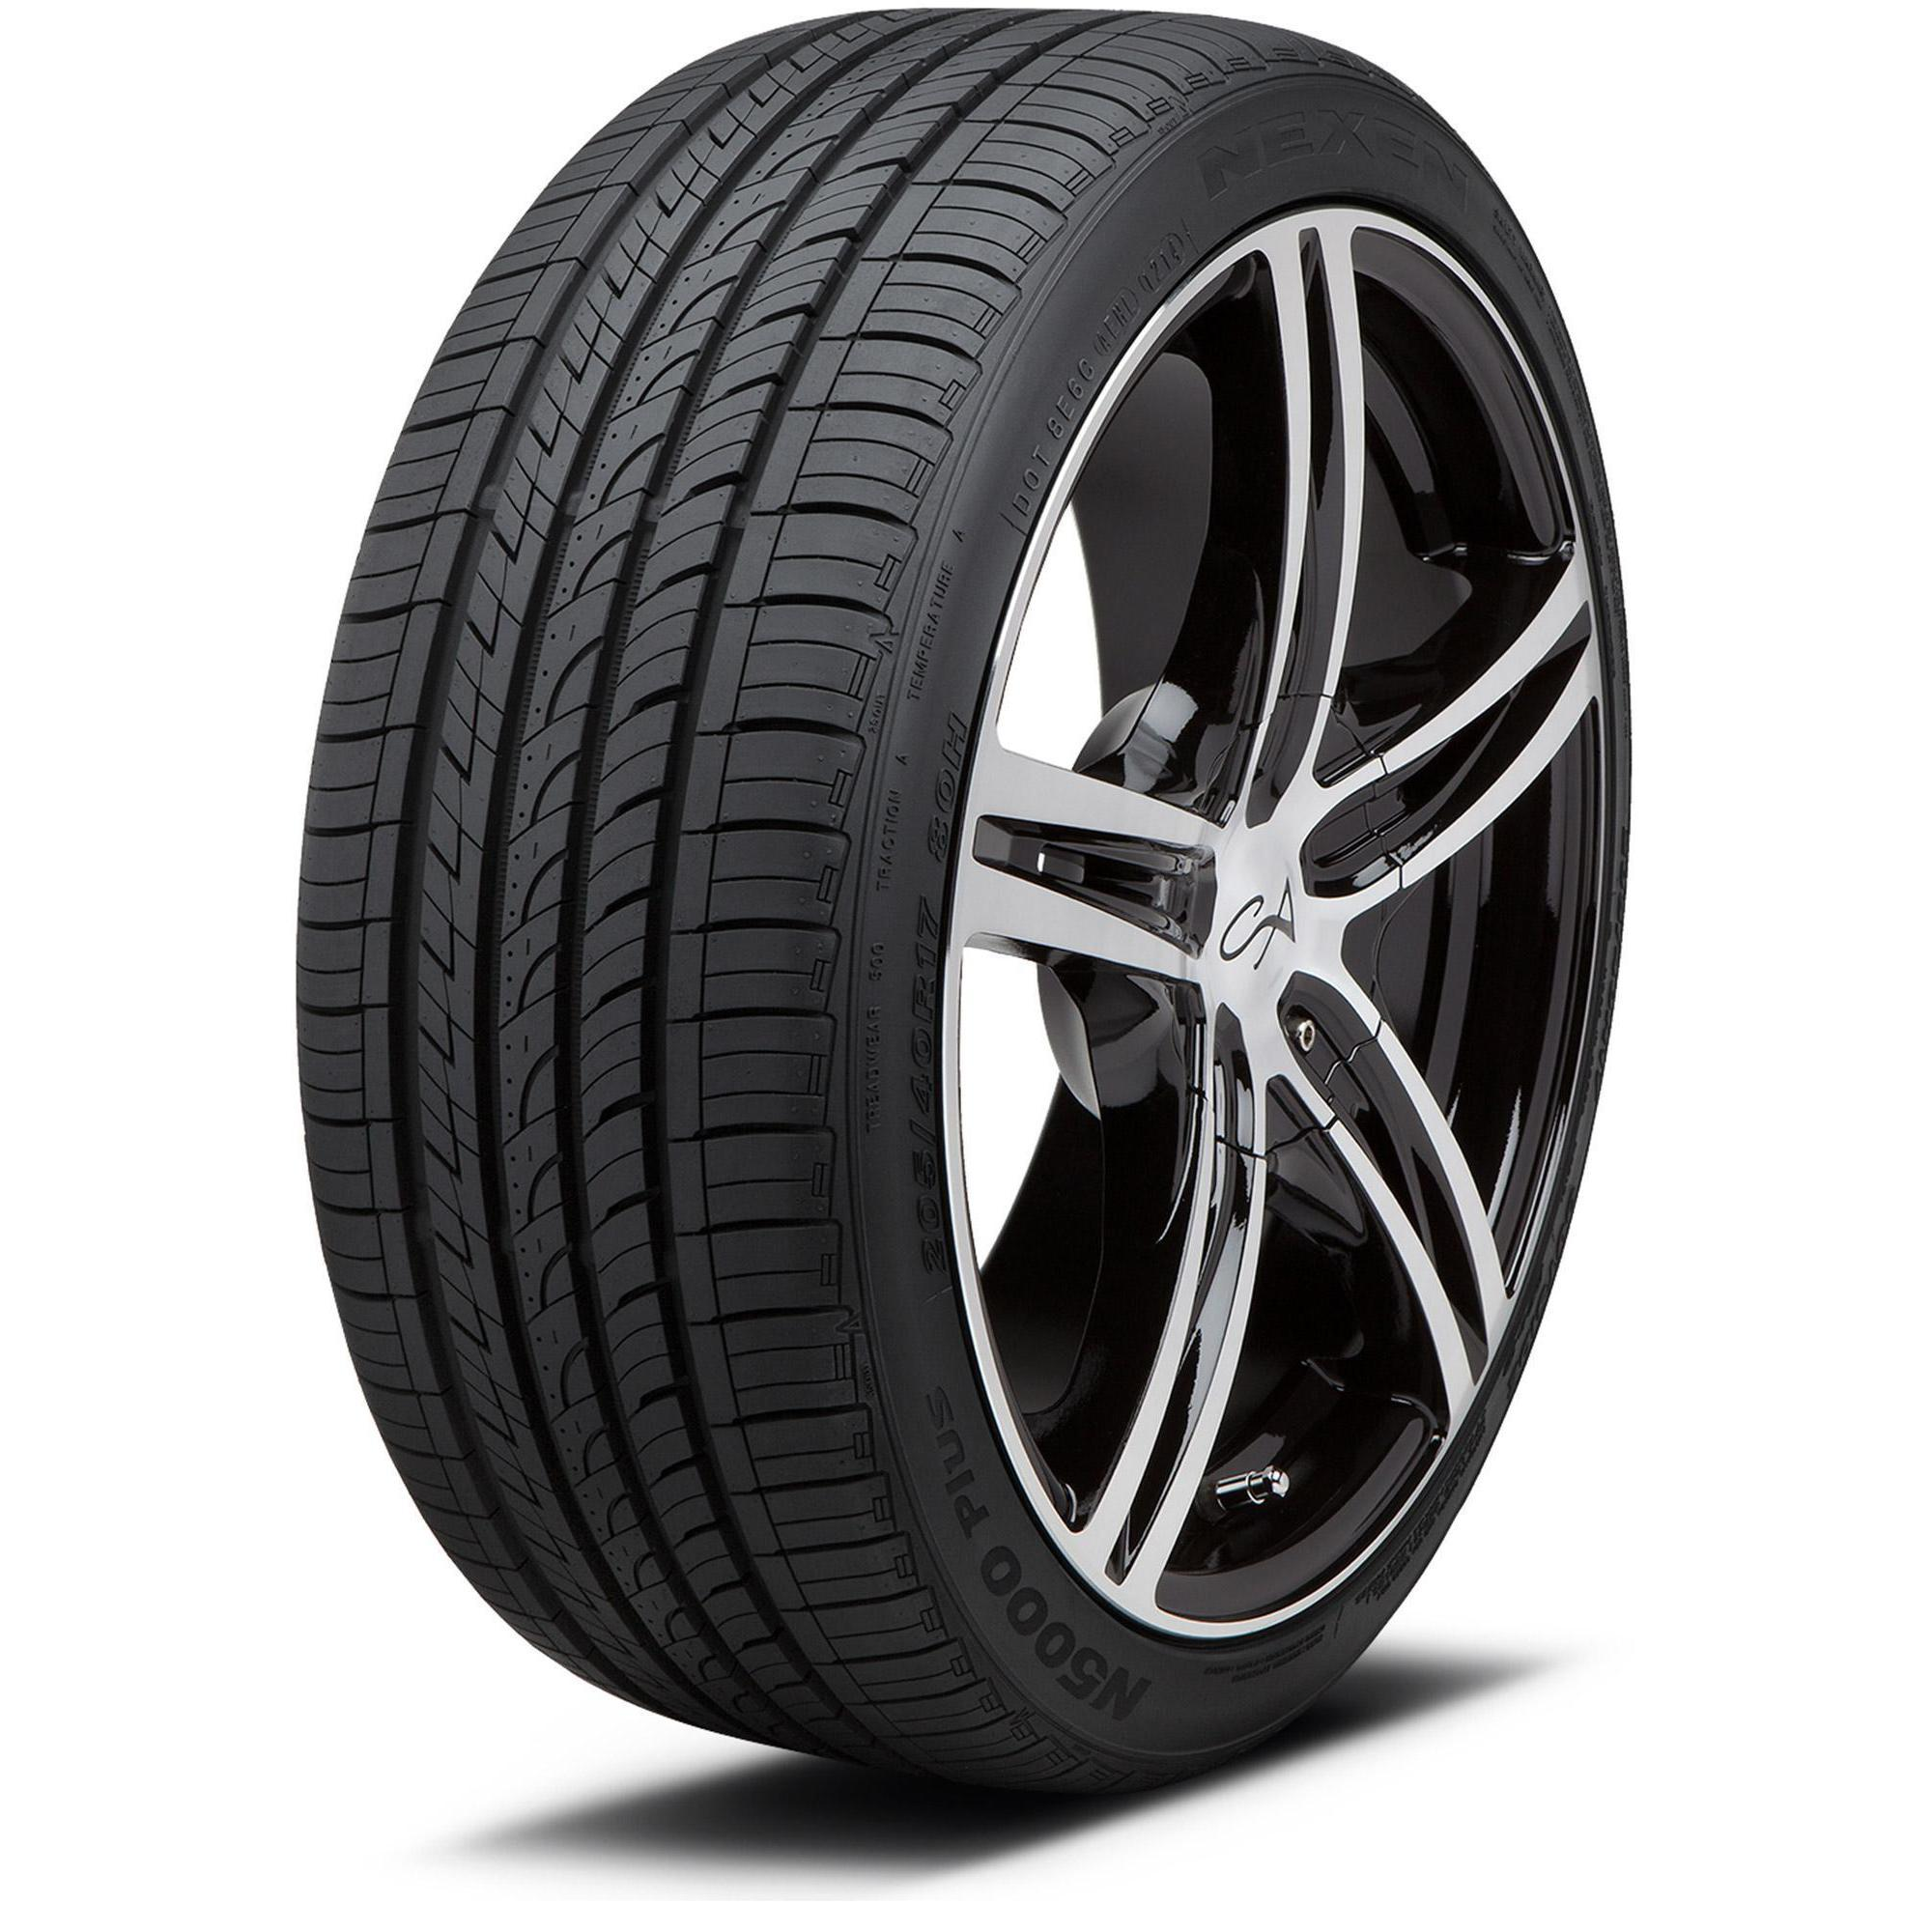 Nexen N5000 195/60 R 14 Tubeless 85 H Car Tyre